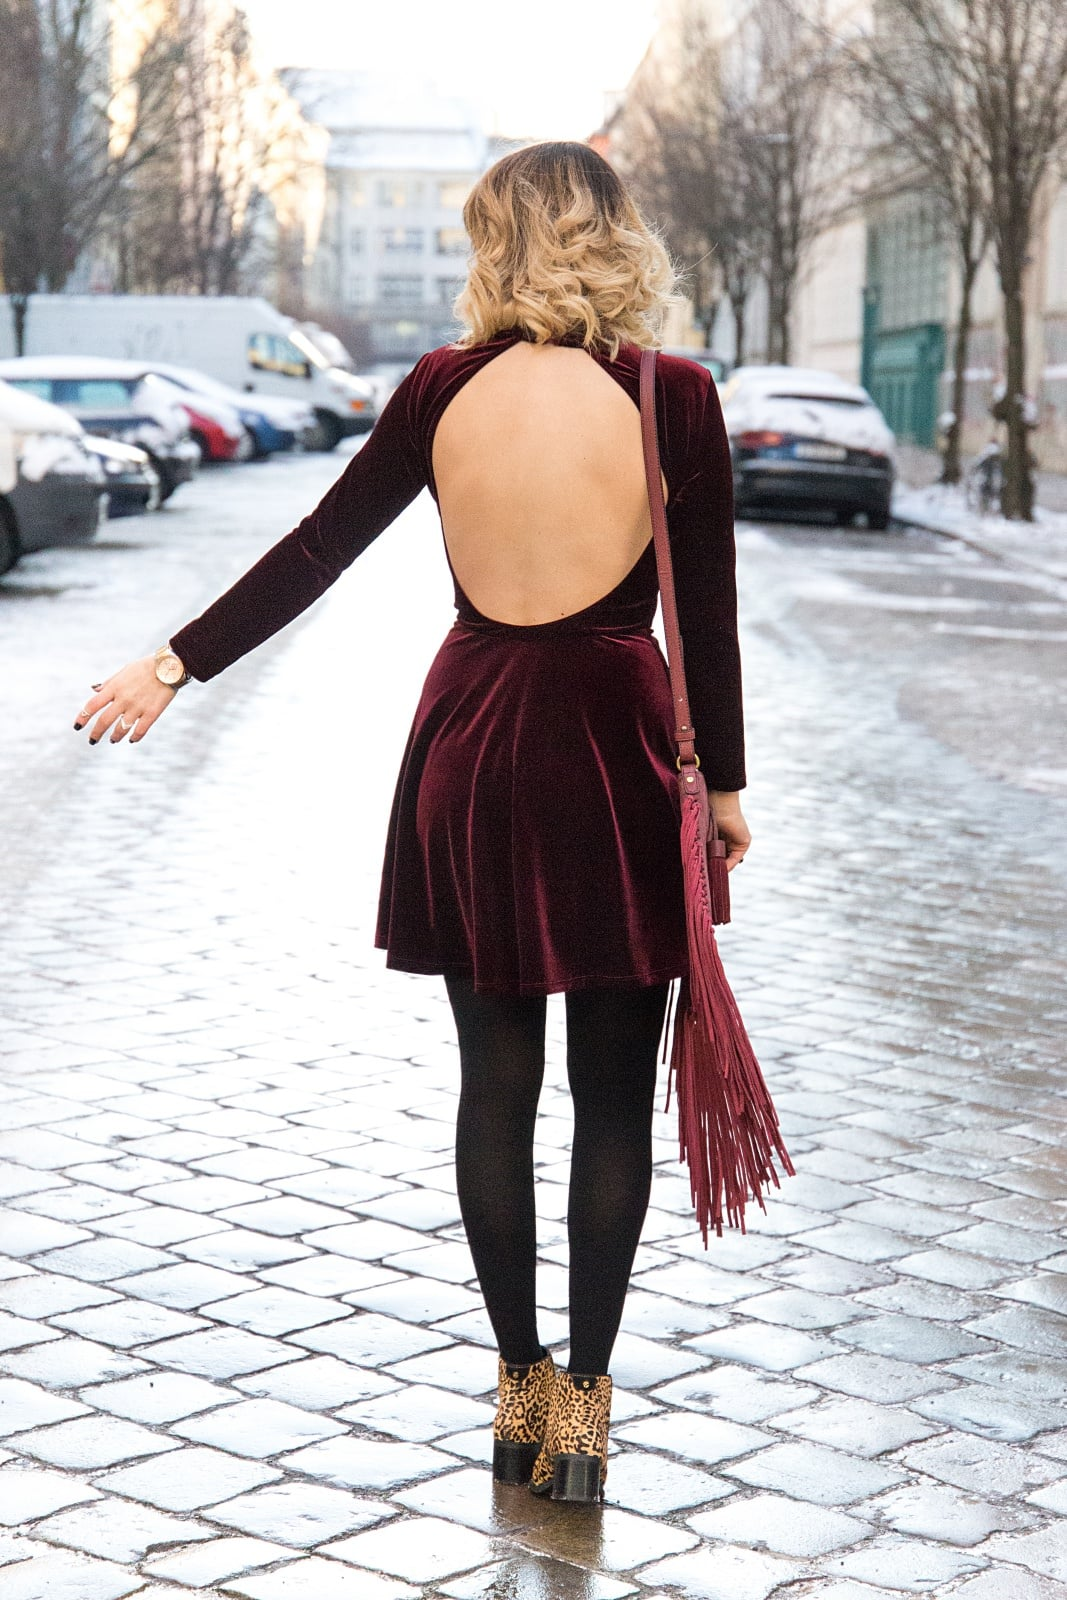 desbelleschoses-fashion-blog-köln-deutschland-berlin-fashion-week-januar-2016-streetstyle-tag-2-samtkleid-leo-boots 1